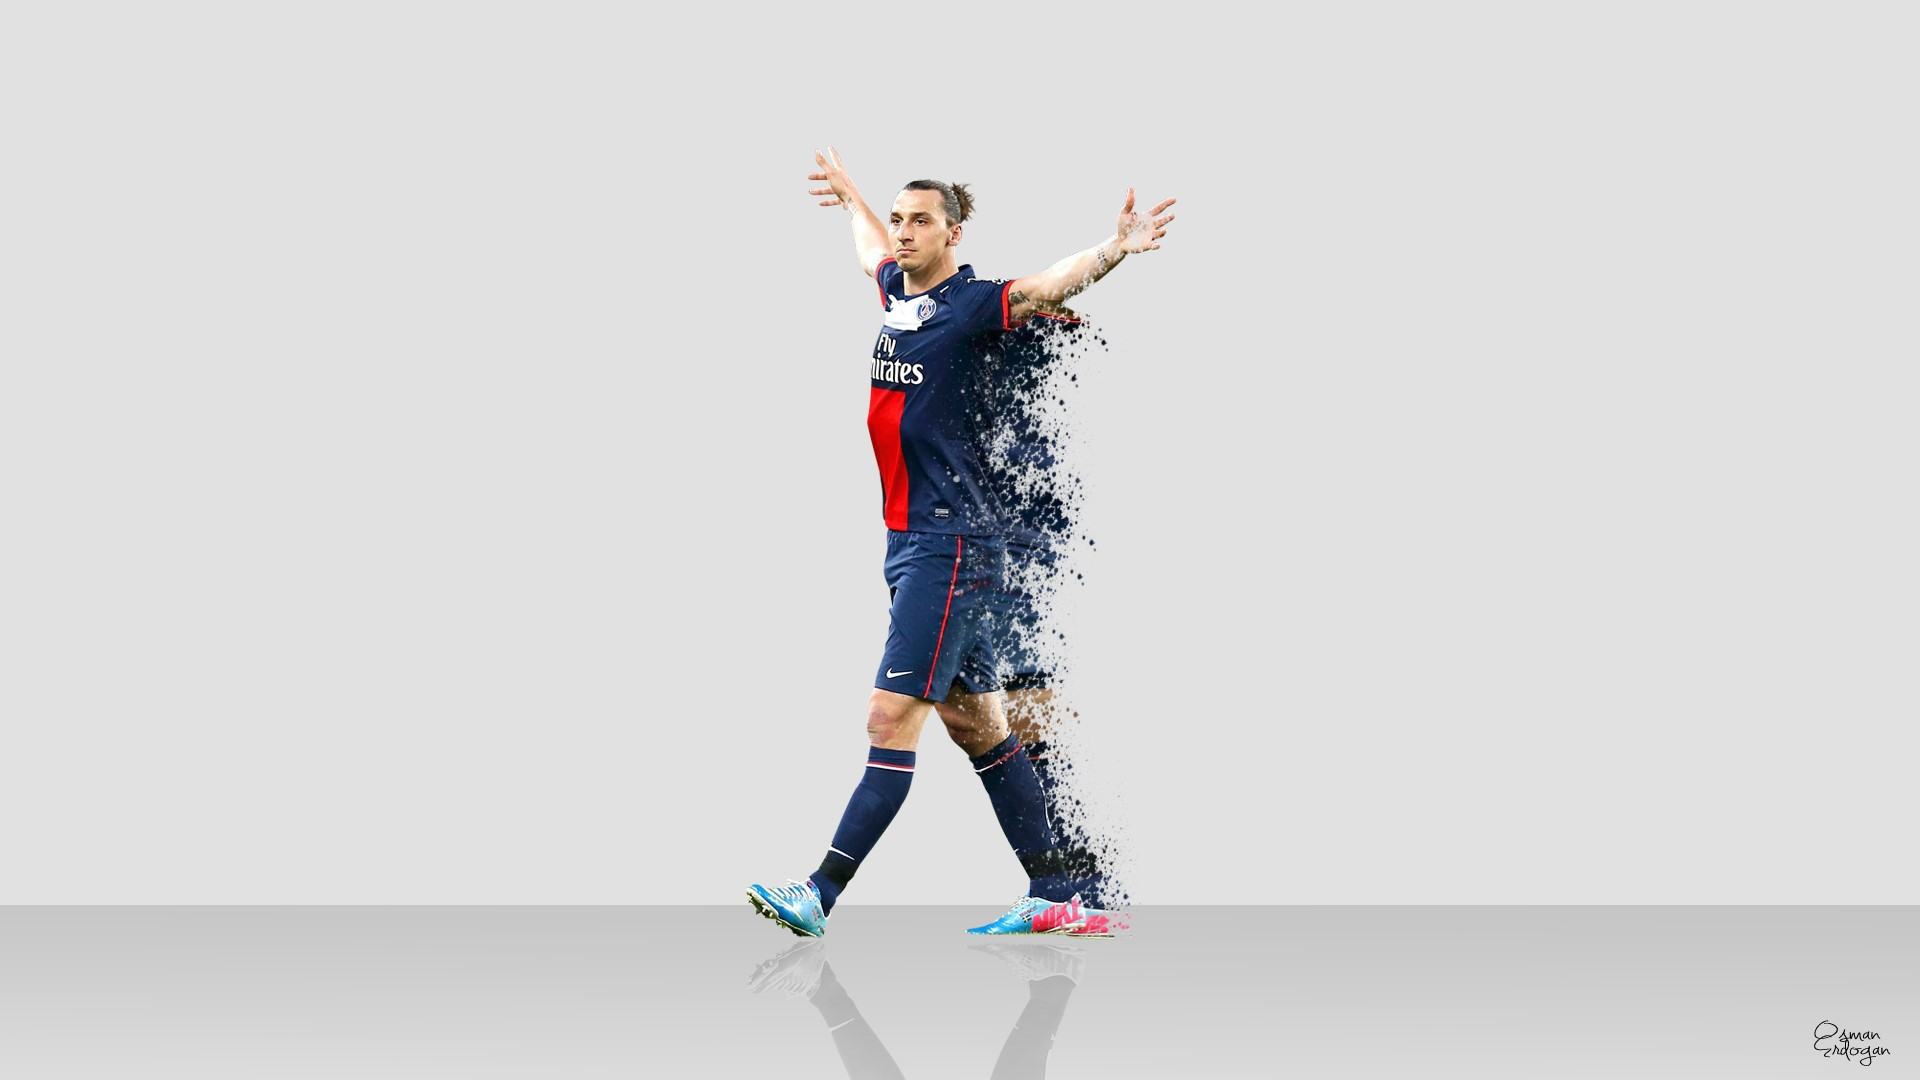 Zlatan Ibrahimovic Photos